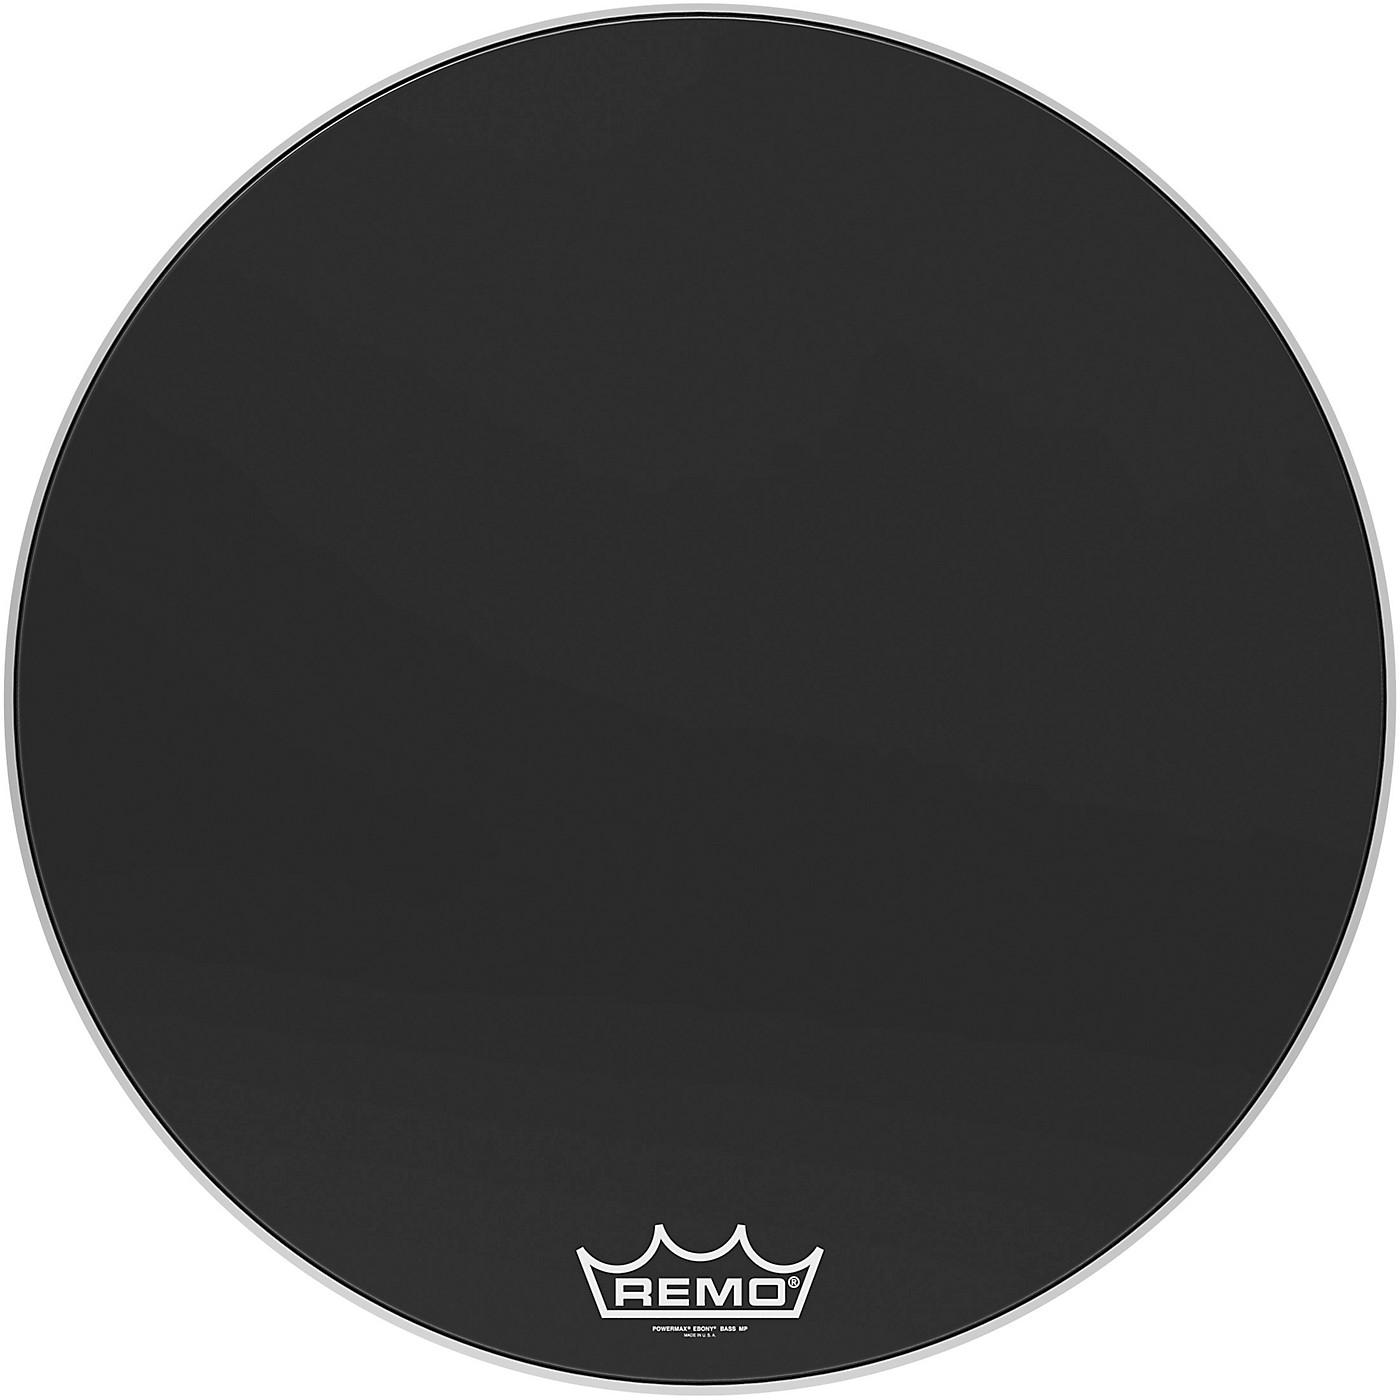 Remo Powermax Ebony Crimplock Bass Drum Head thumbnail